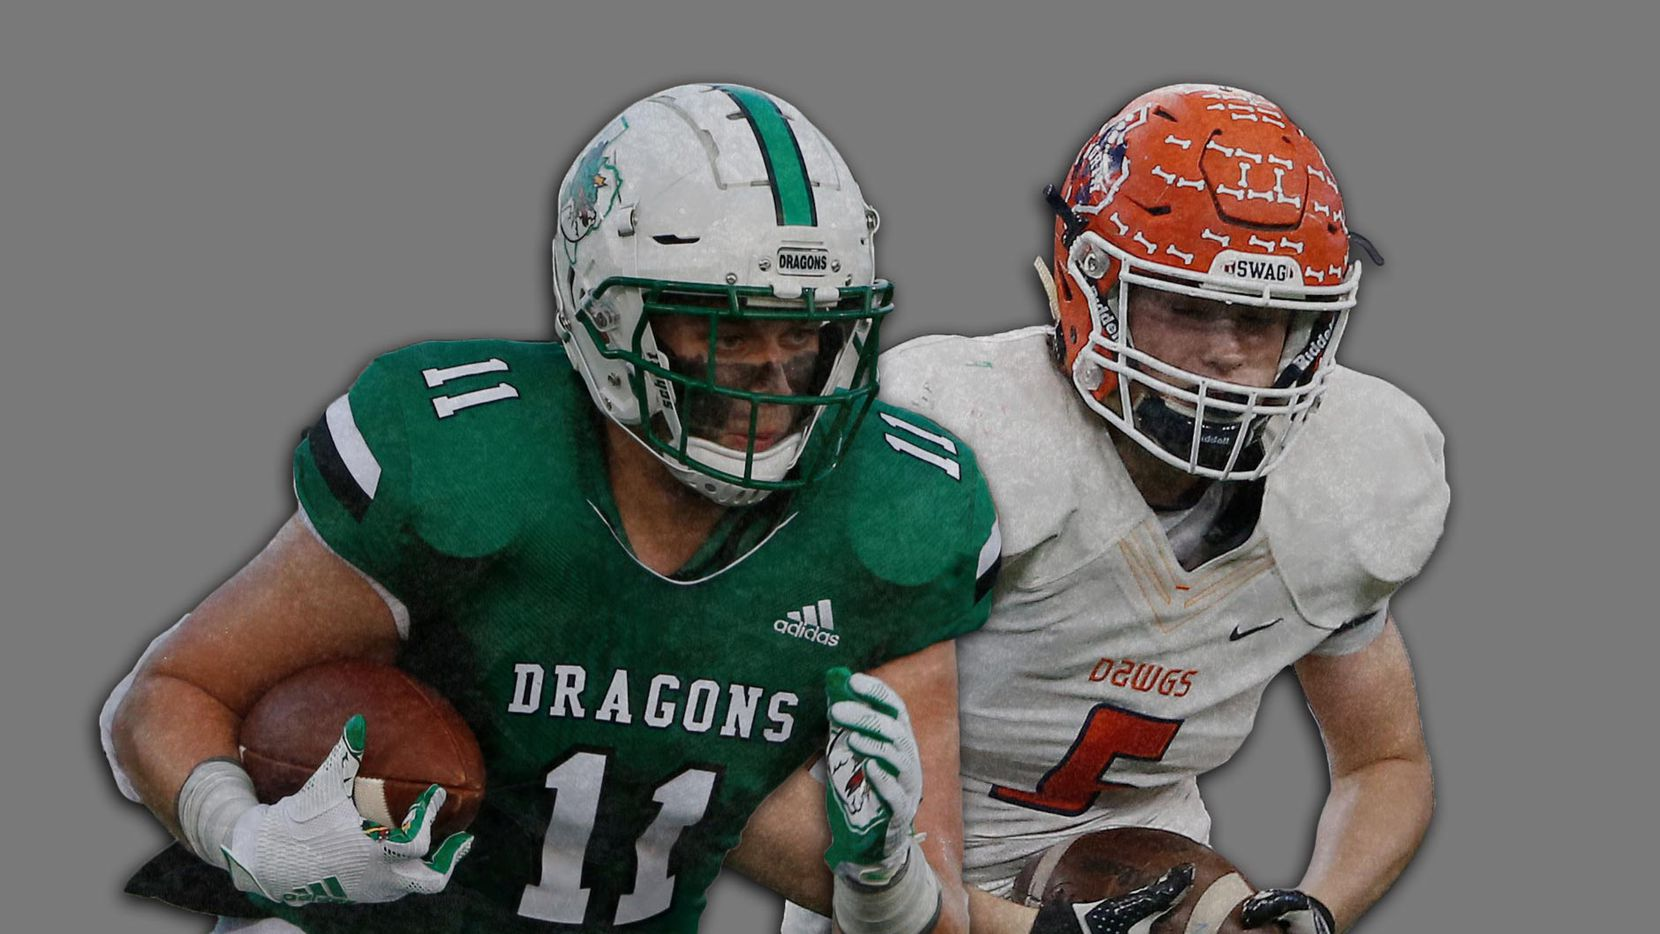 Blake Smith and Brandon Frazier.